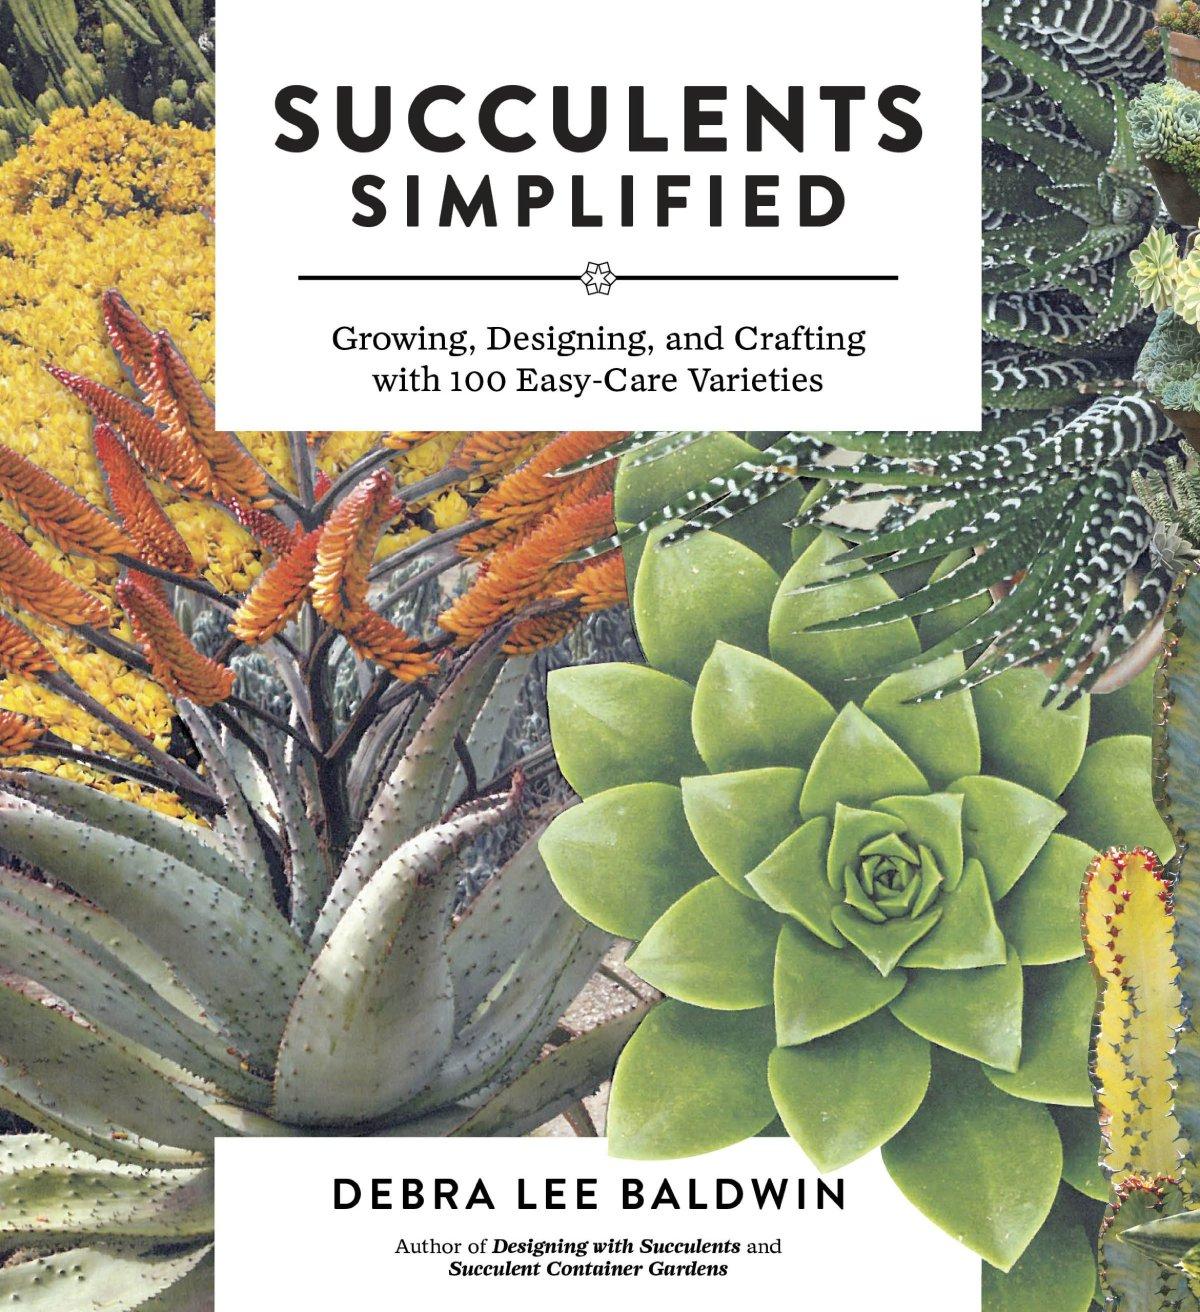 Succulents Simplified by Debra Lee Baldwin